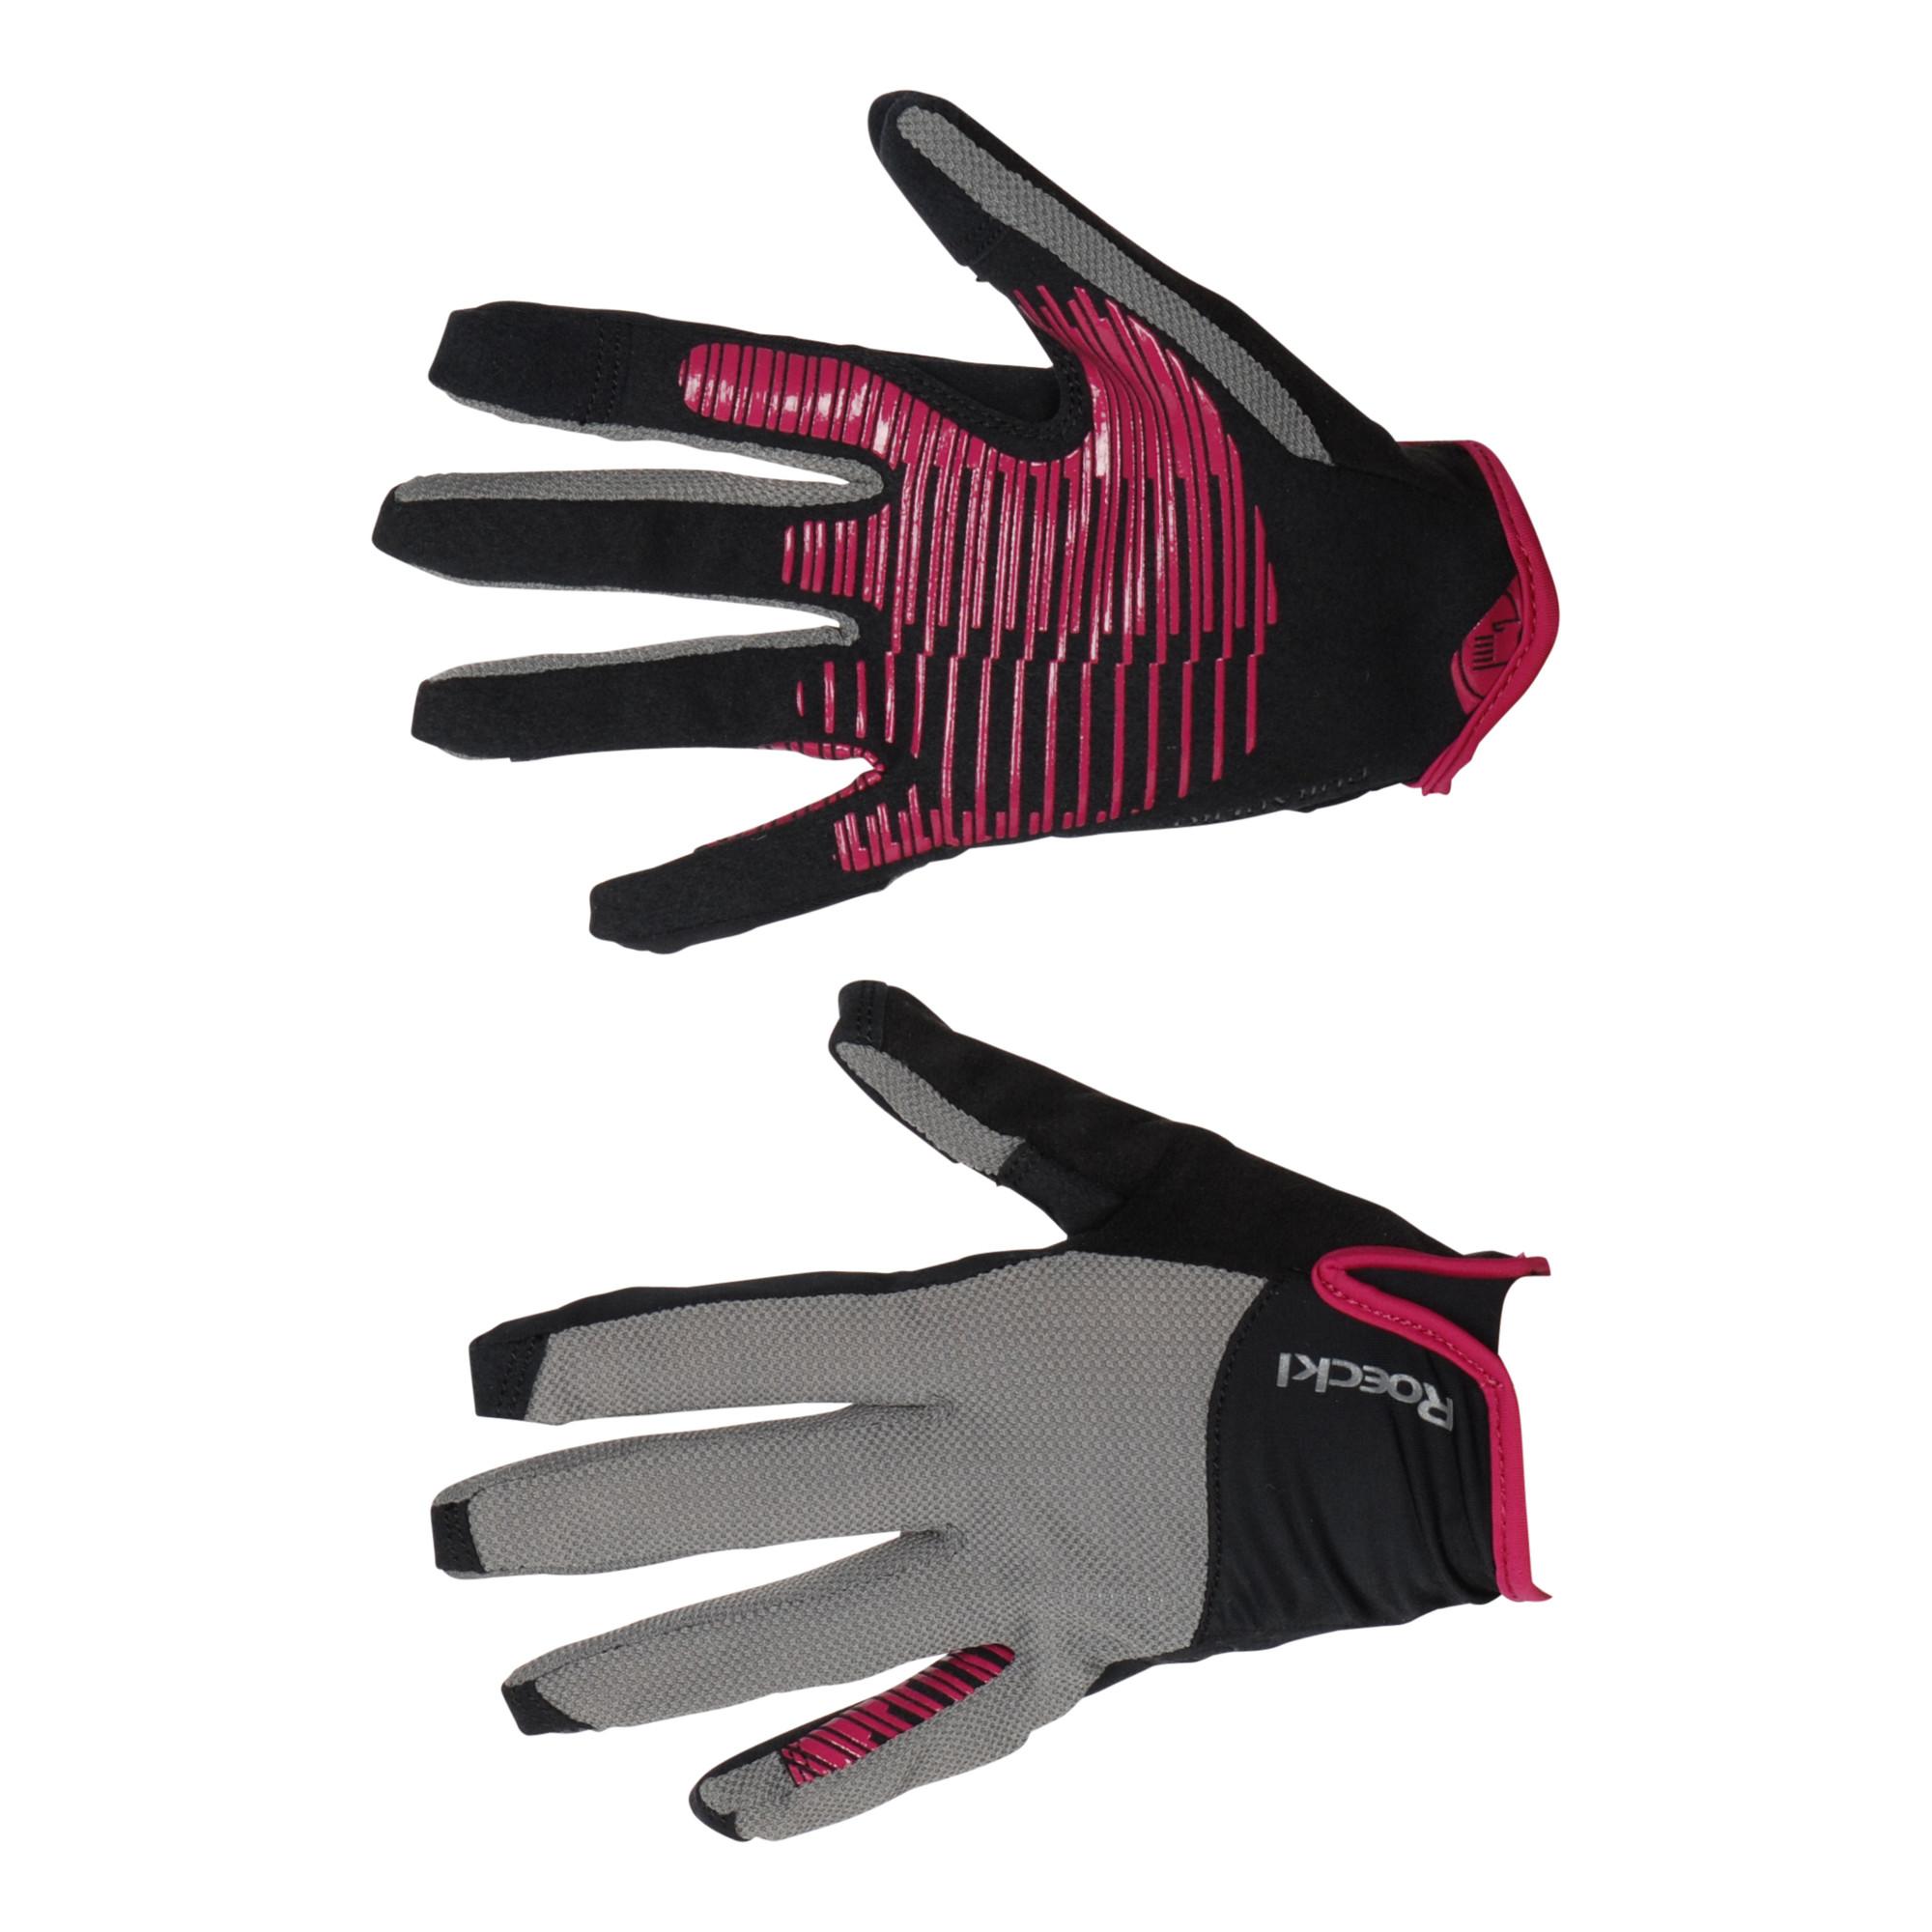 Roeckl Lynn handschoen zwart/grijs maat:7,5